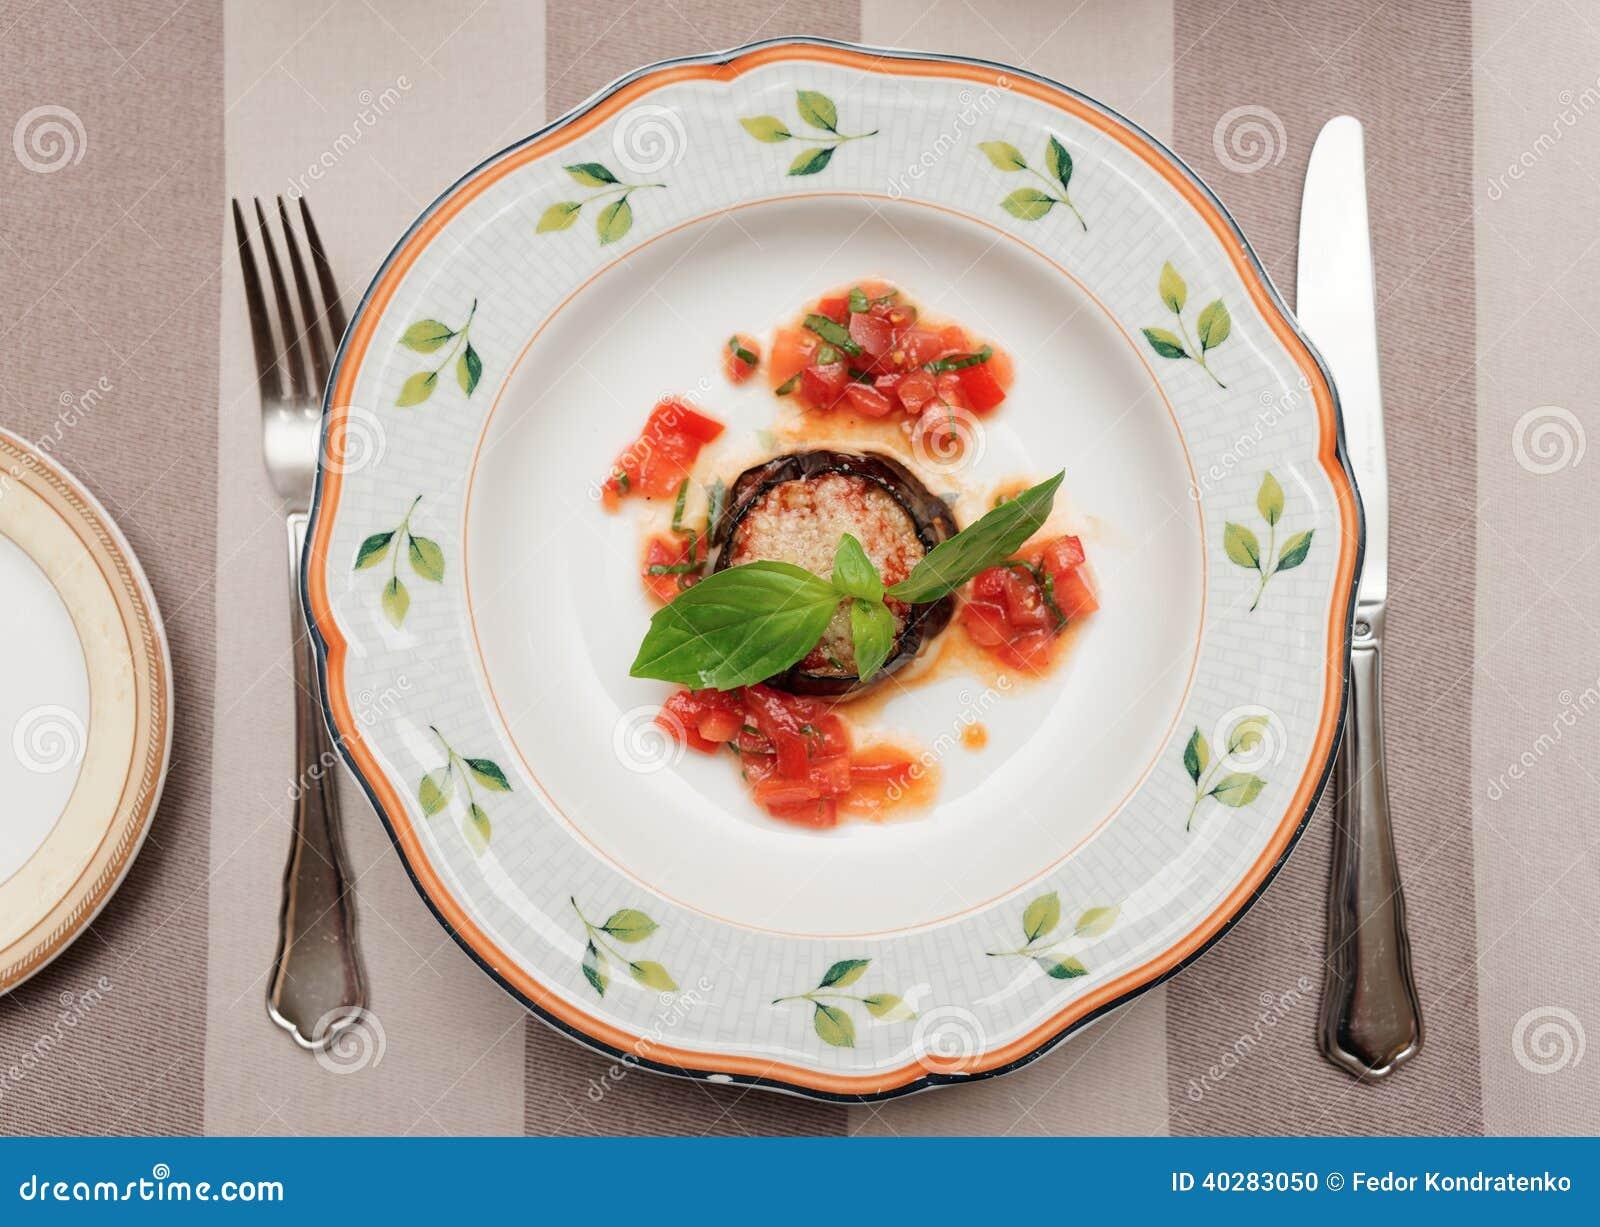 Баклажан с сыром и томатом